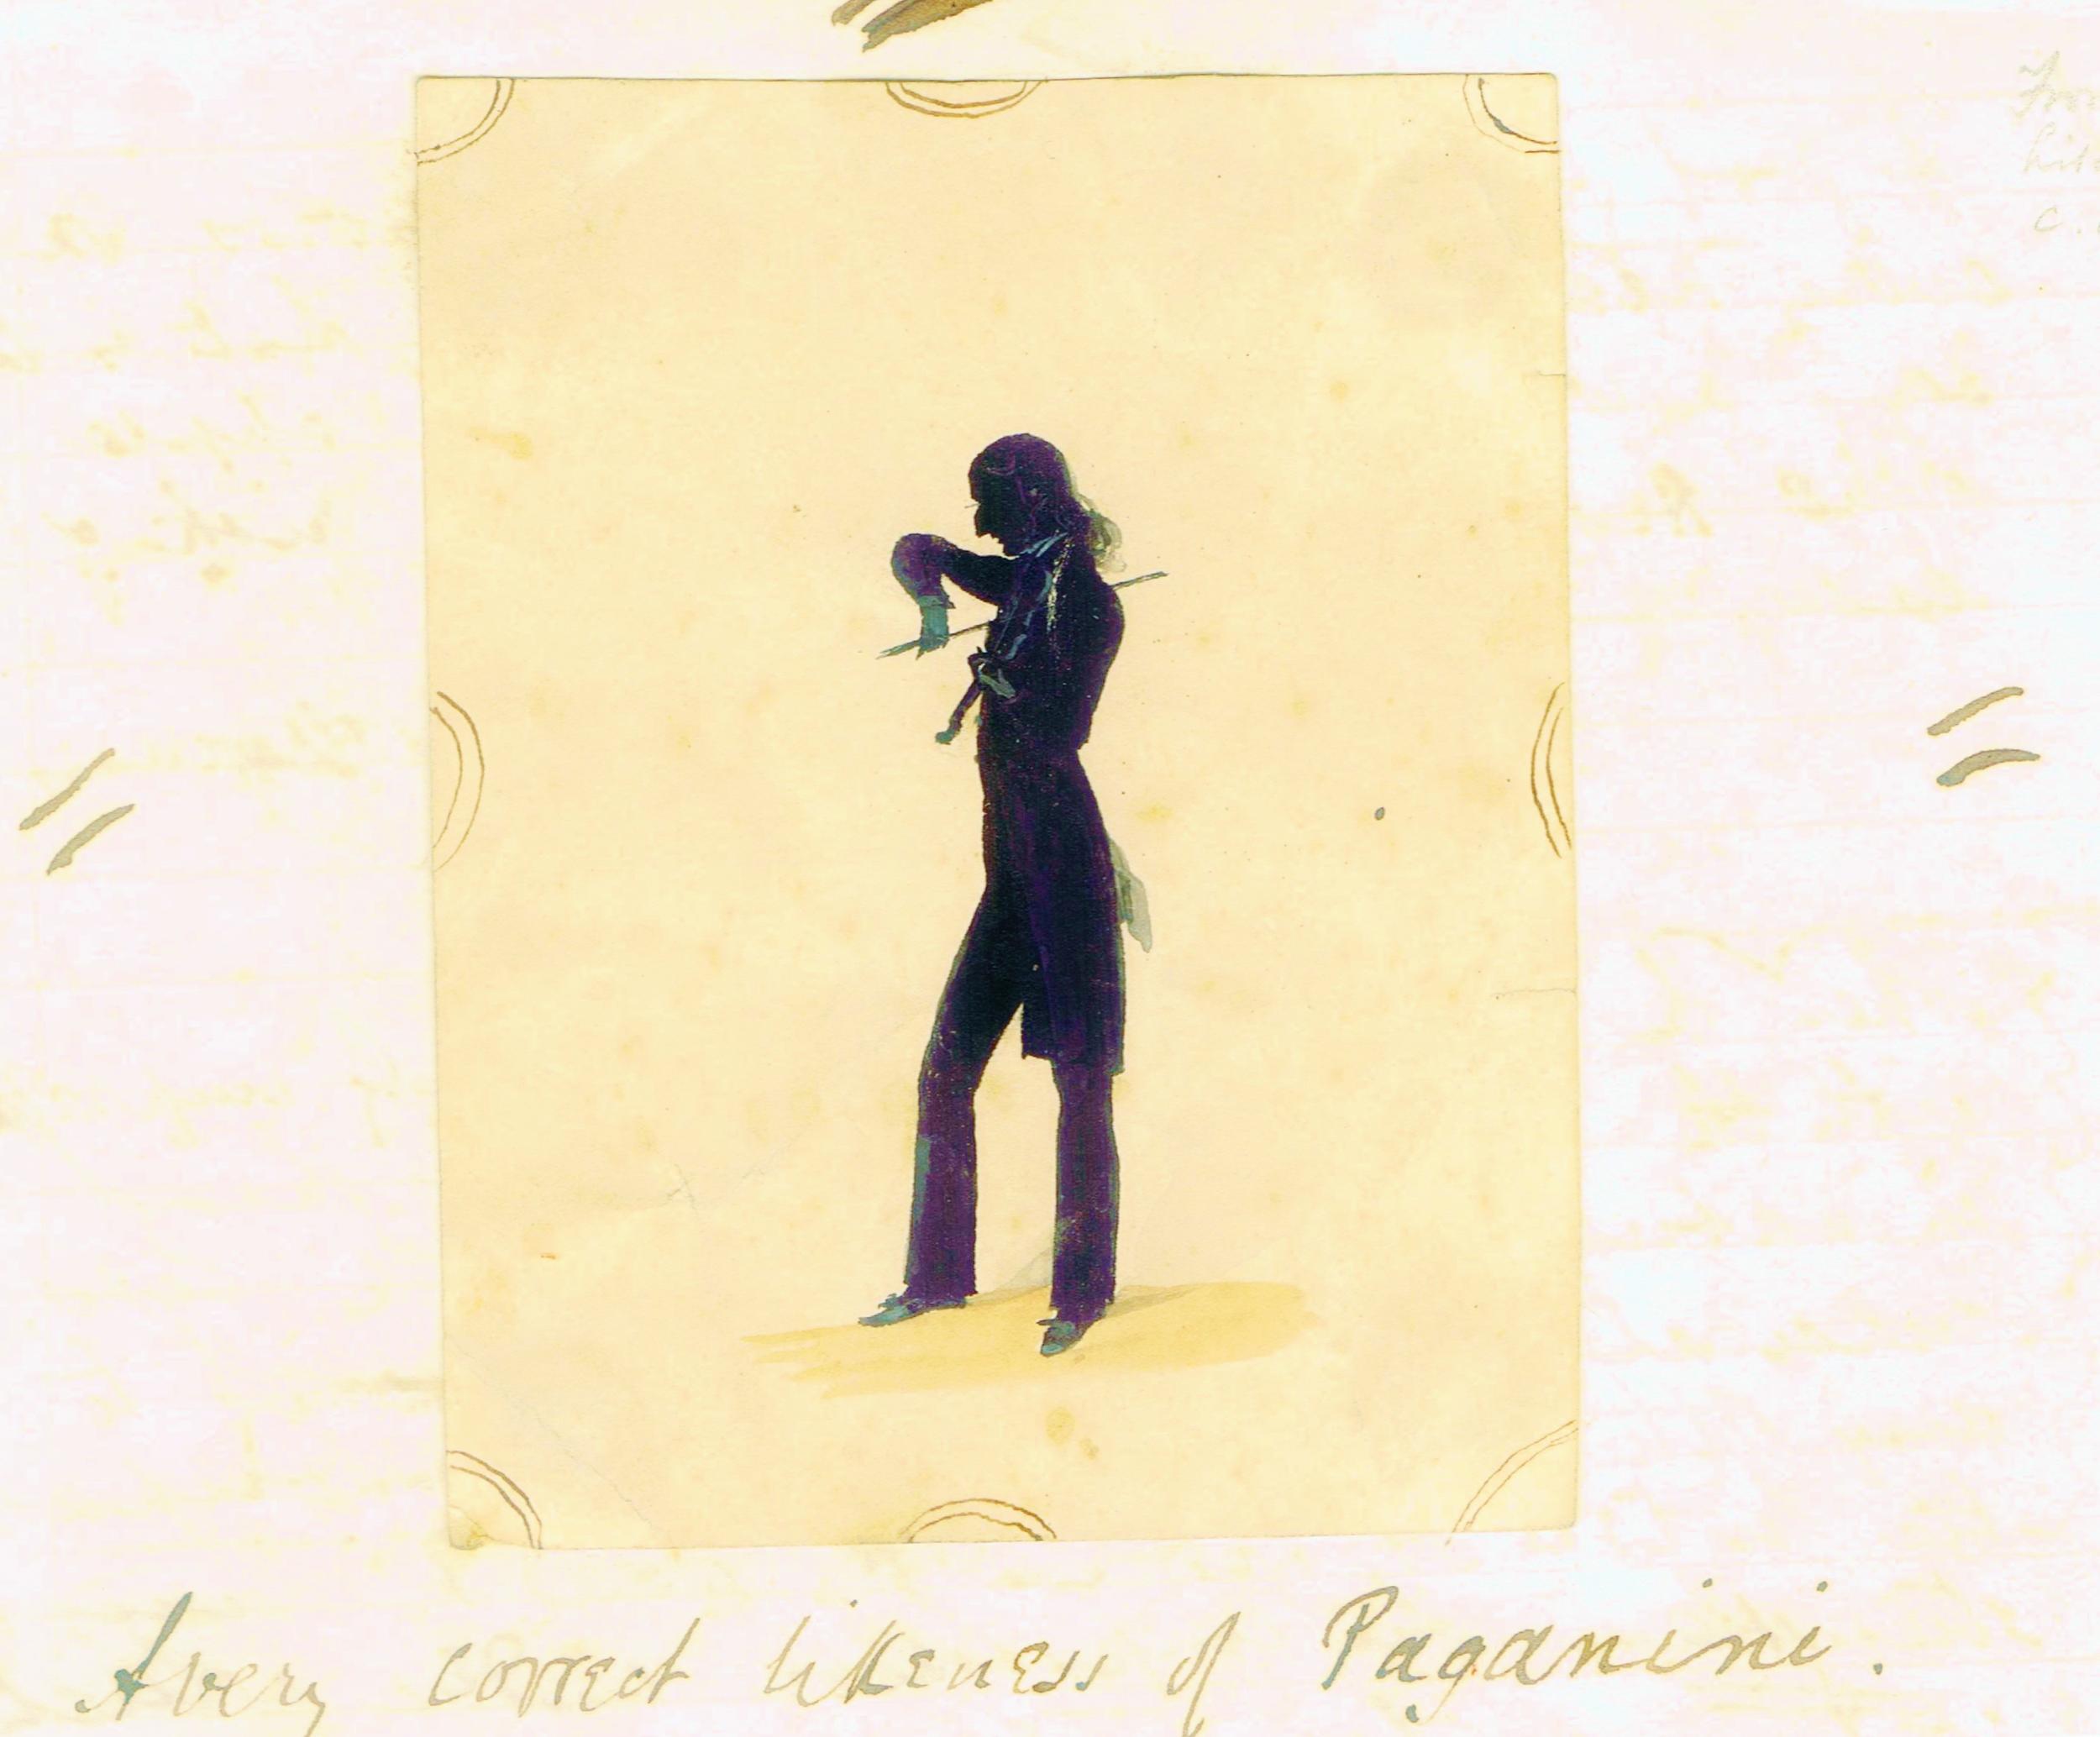 Paganini's Hip